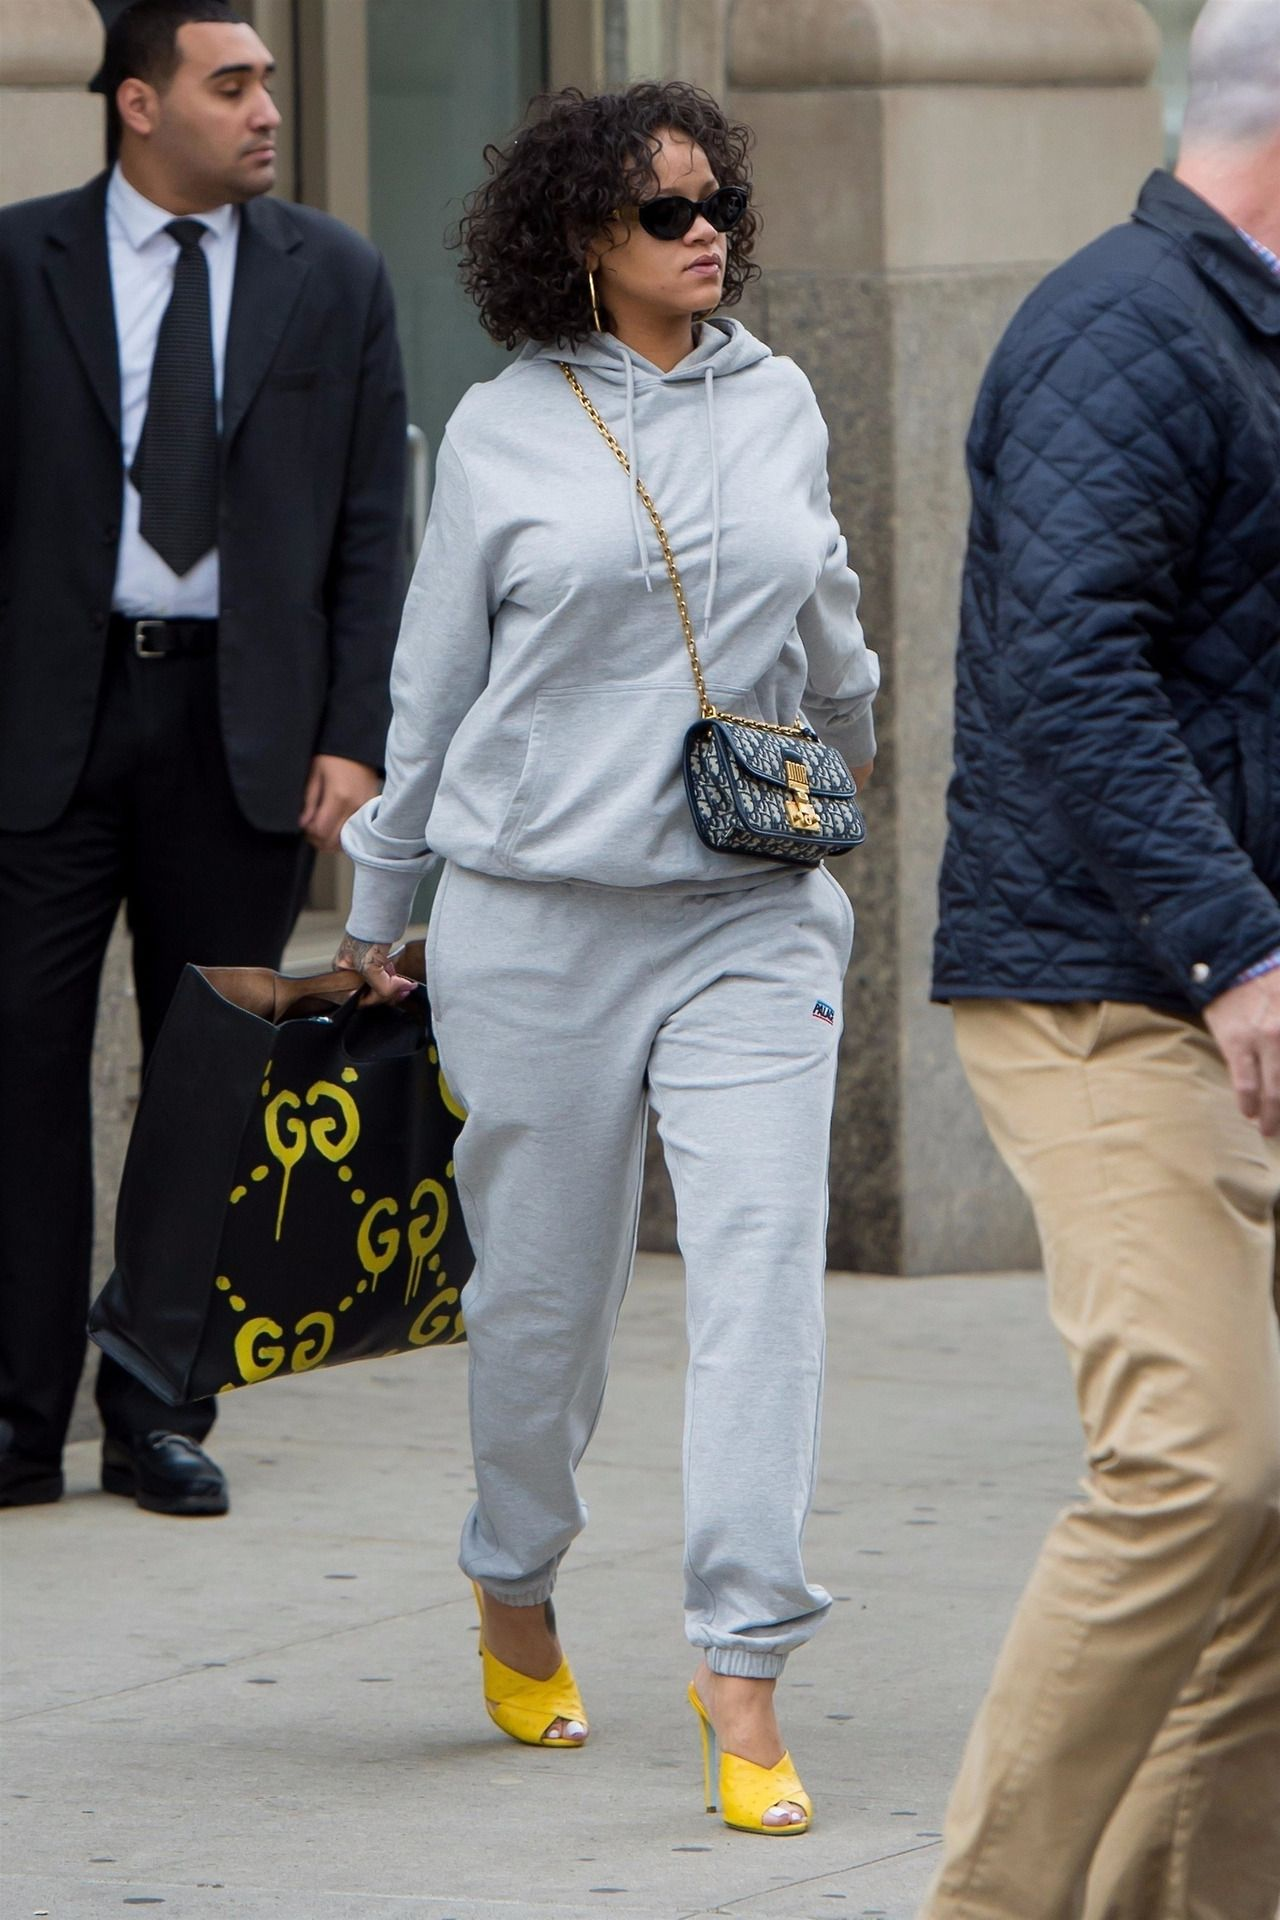 6227ba3e9 Rihanna leaving her apartment in NYC. (October 26, 2017) | MyGalRiRi ...